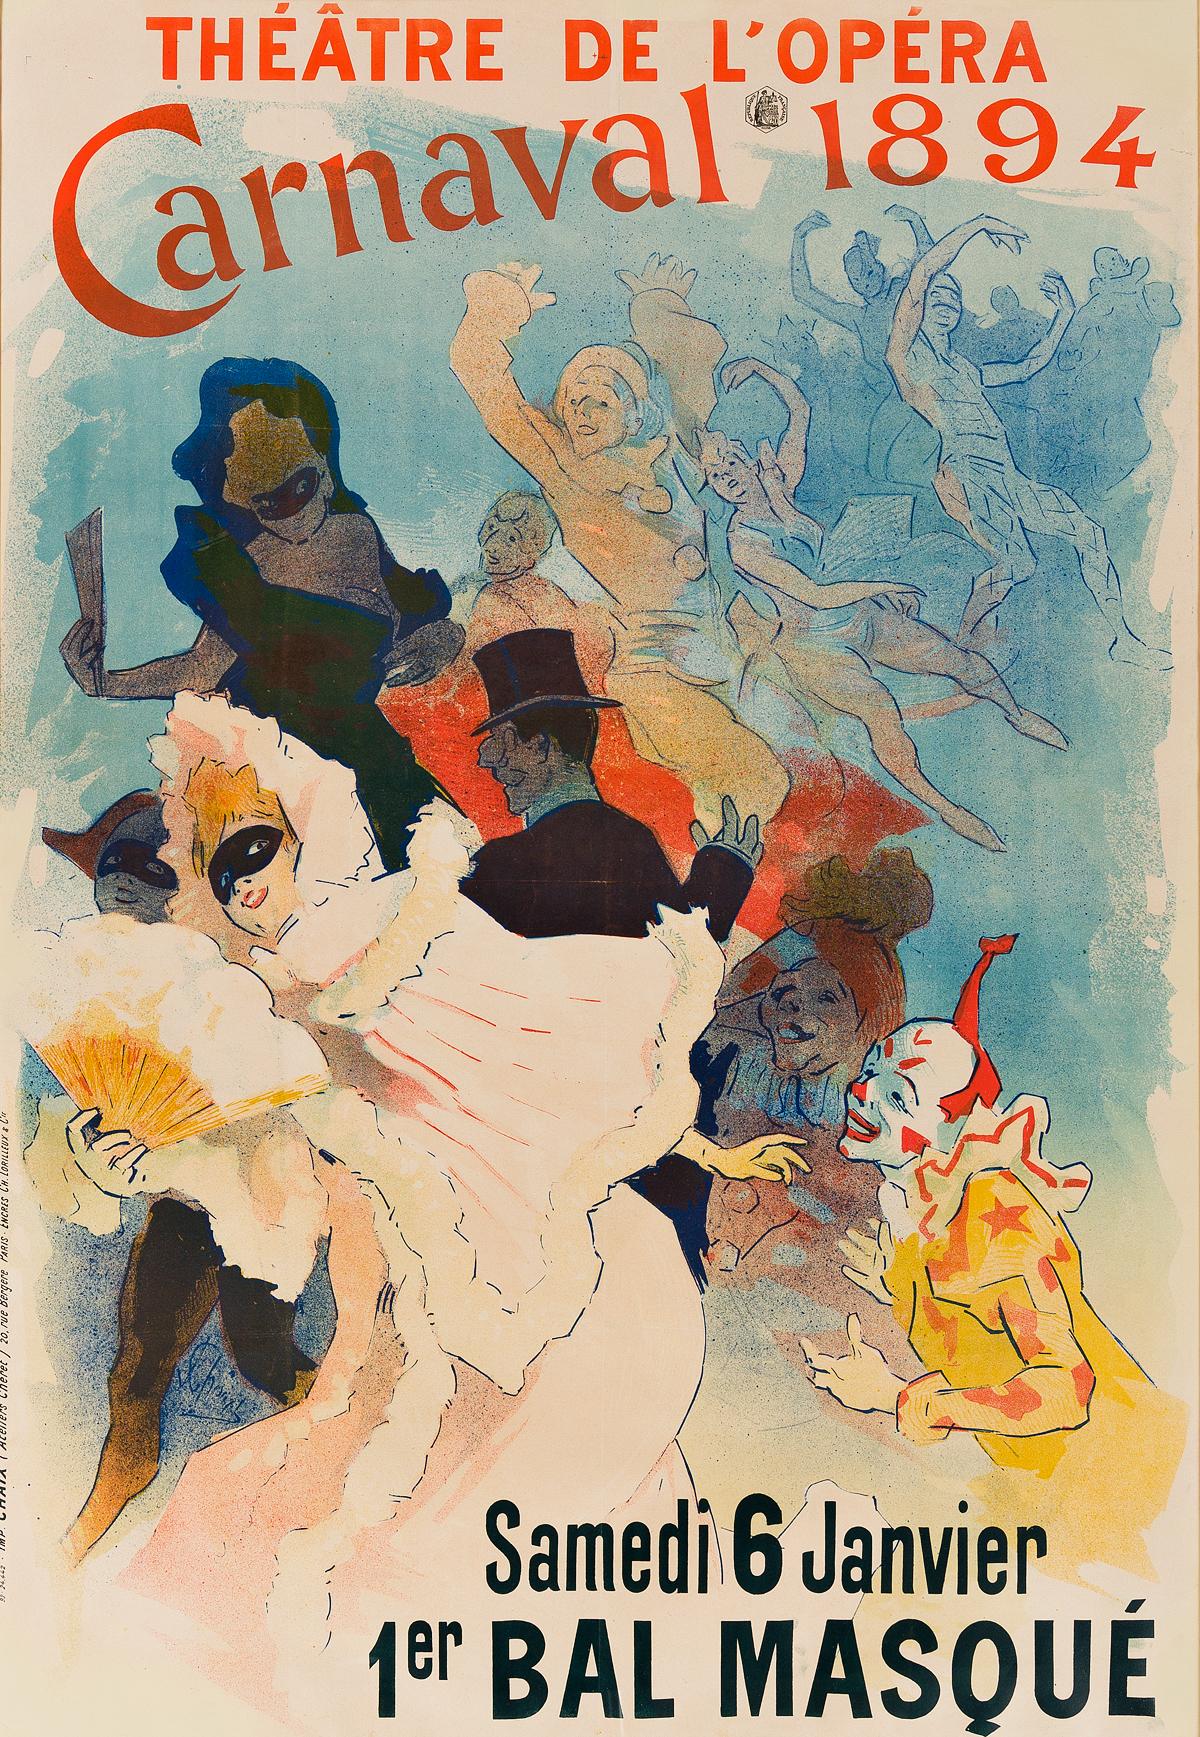 JULES CHÉRET (1836-1932). CARNAVAL / 1ER BAL MASQUÉ. 1894. 48x33 inches, 122x84 cm. Chaix, Paris.